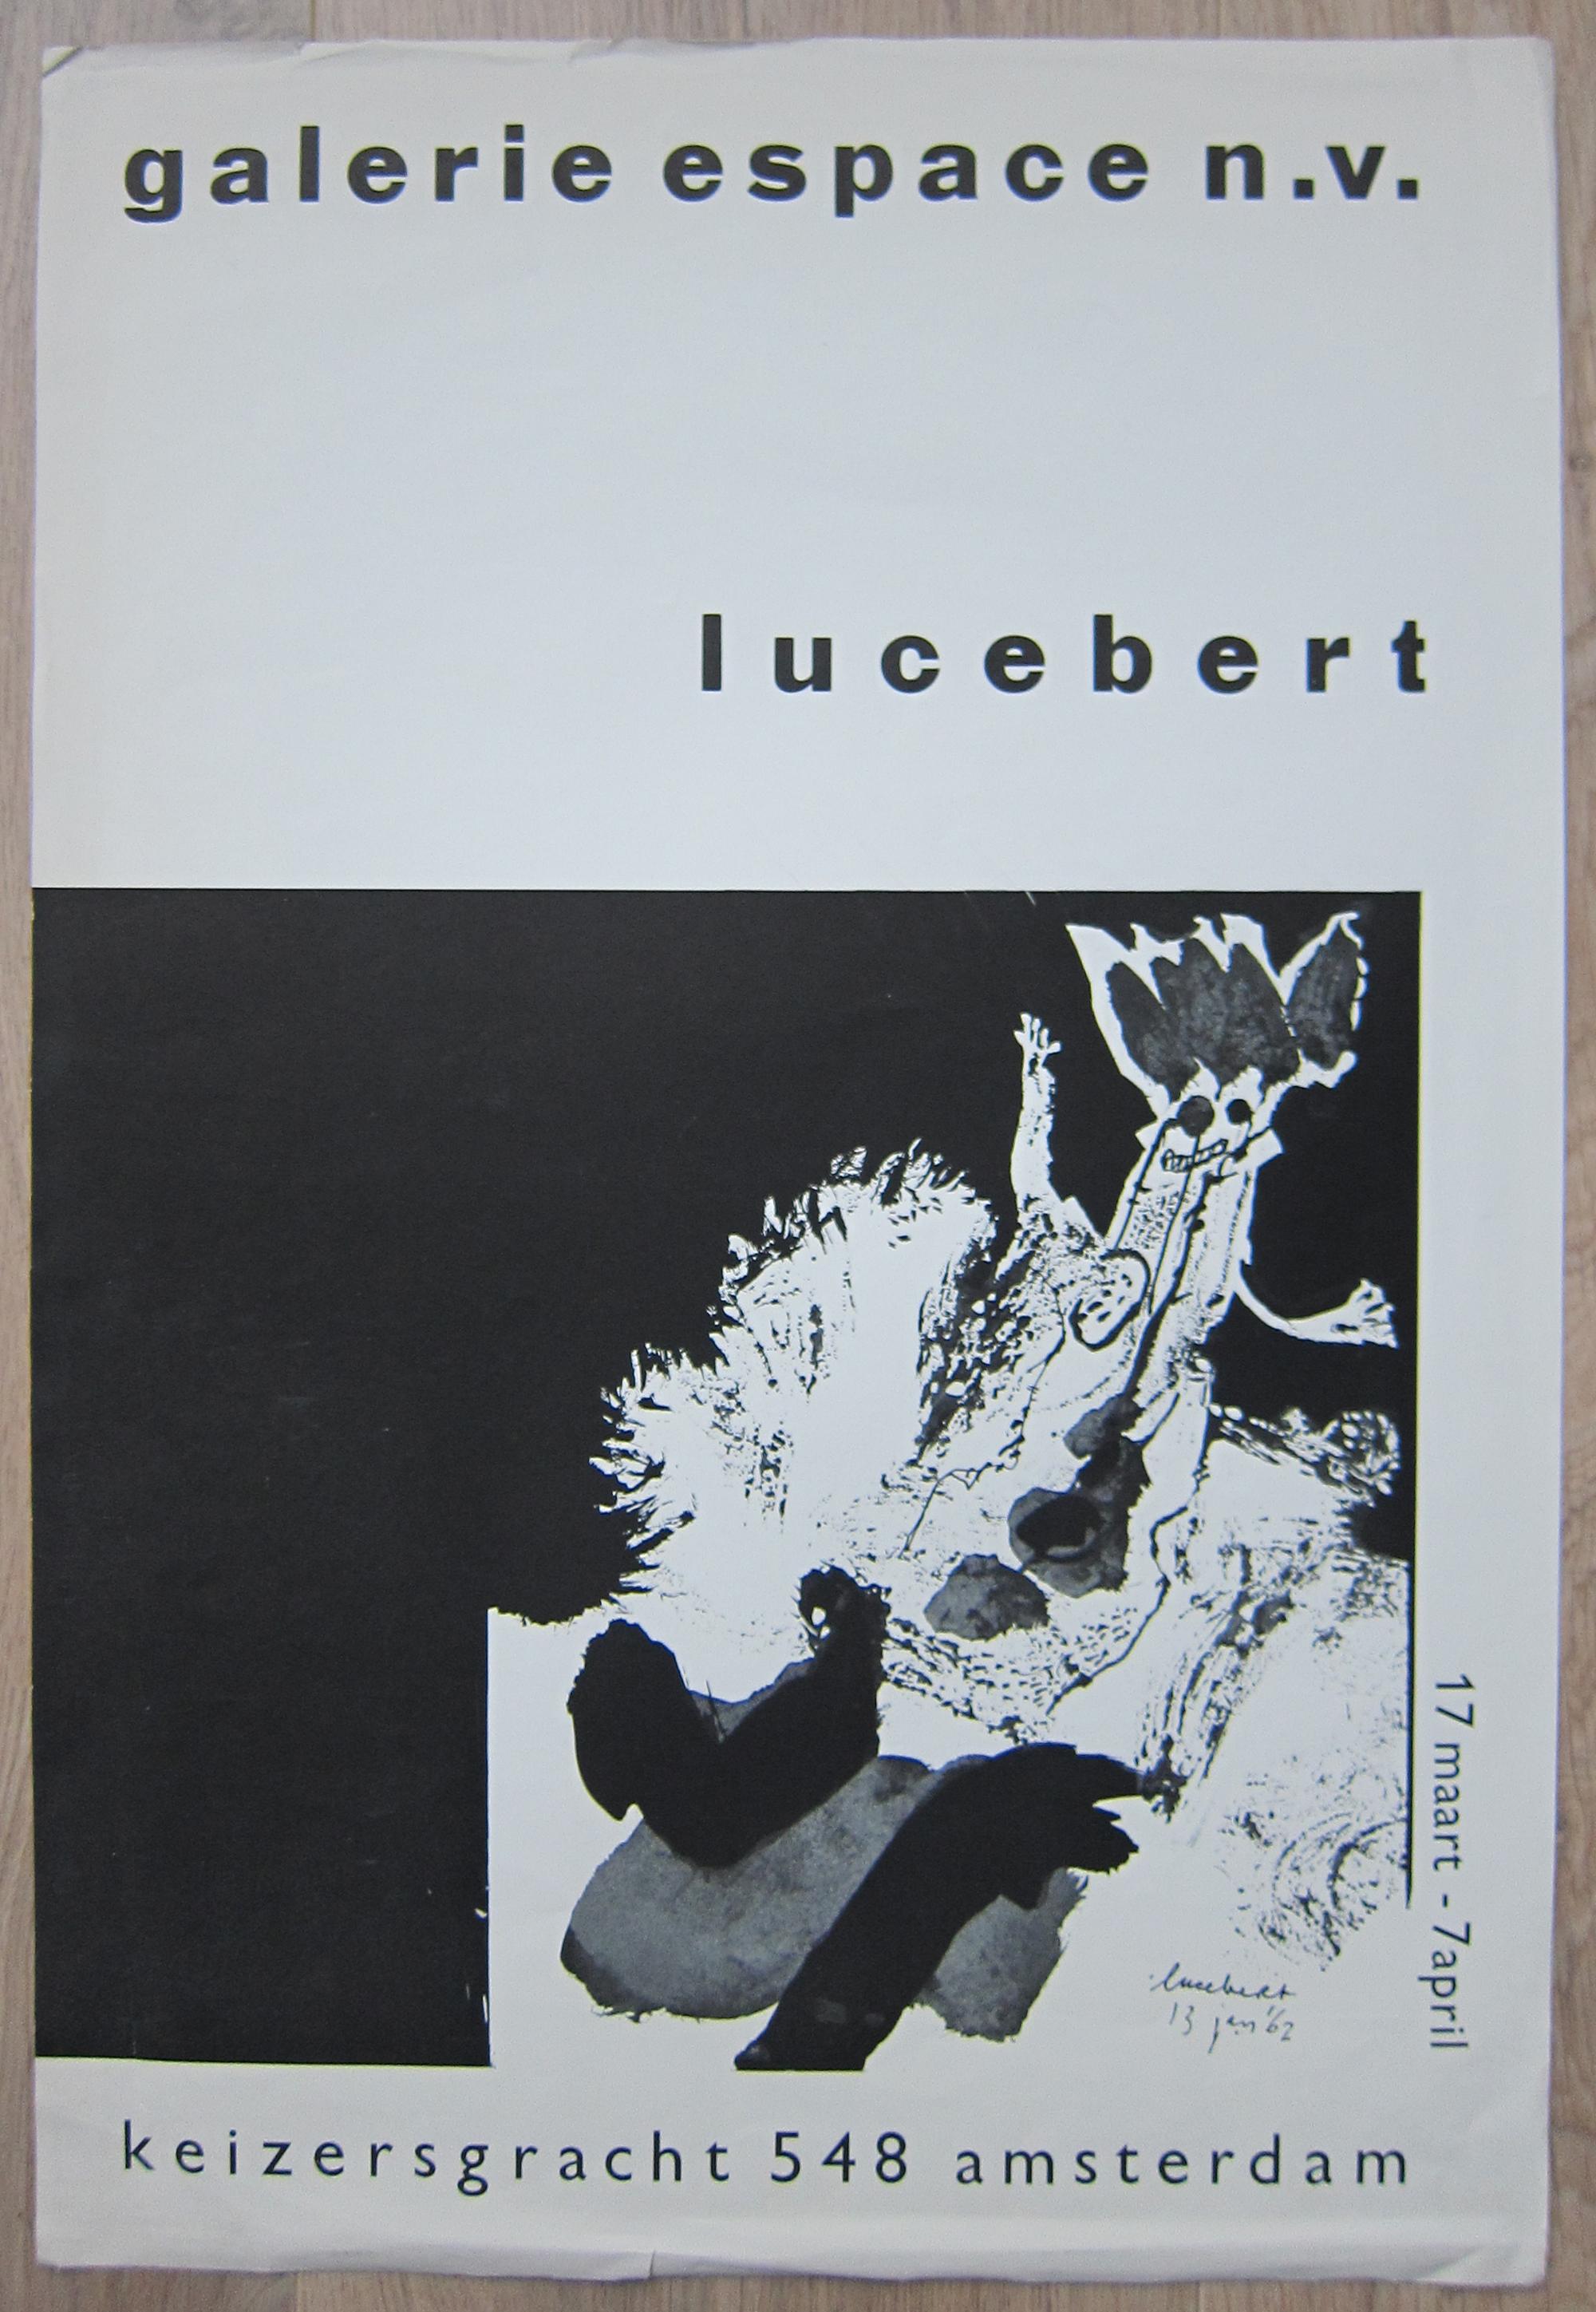 lucebert-espace-aaa